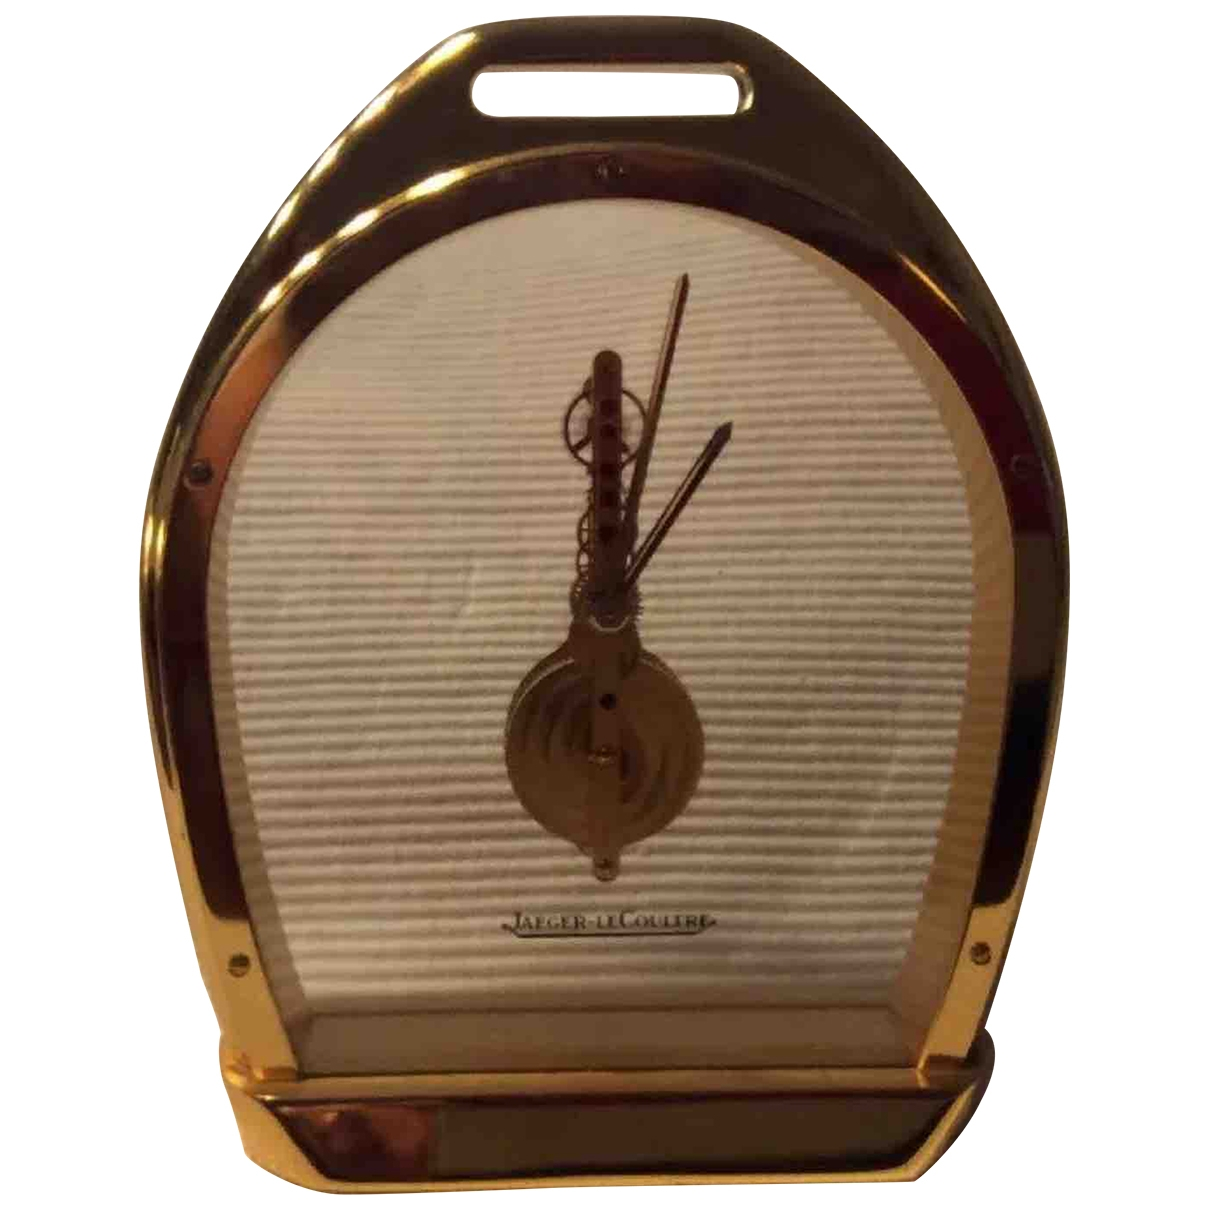 Reloj Jaeger-lecoultre